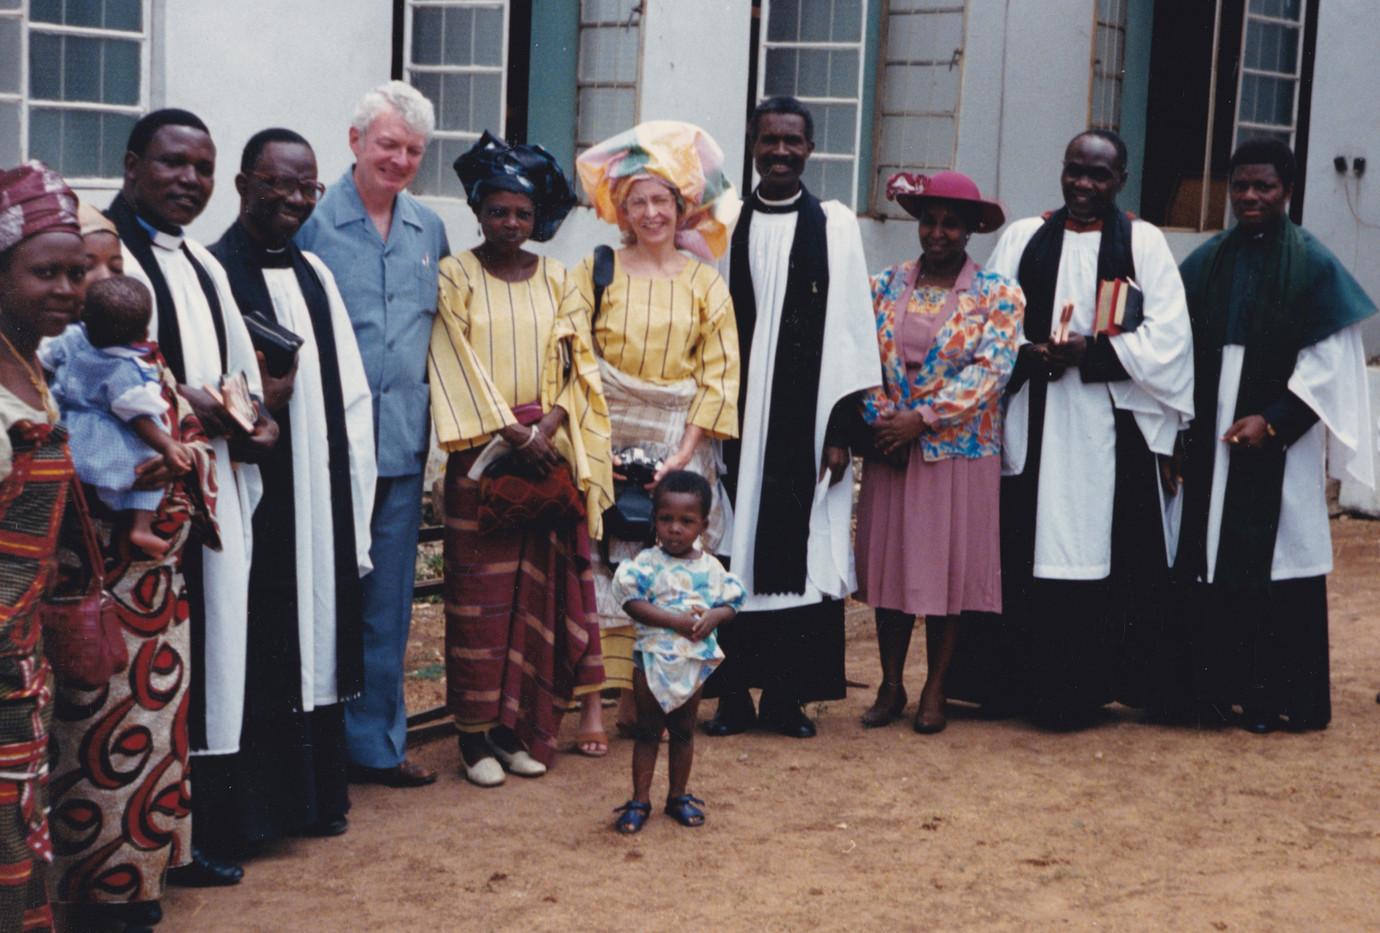 1987 Revisiting church in Ilorin Nigeria